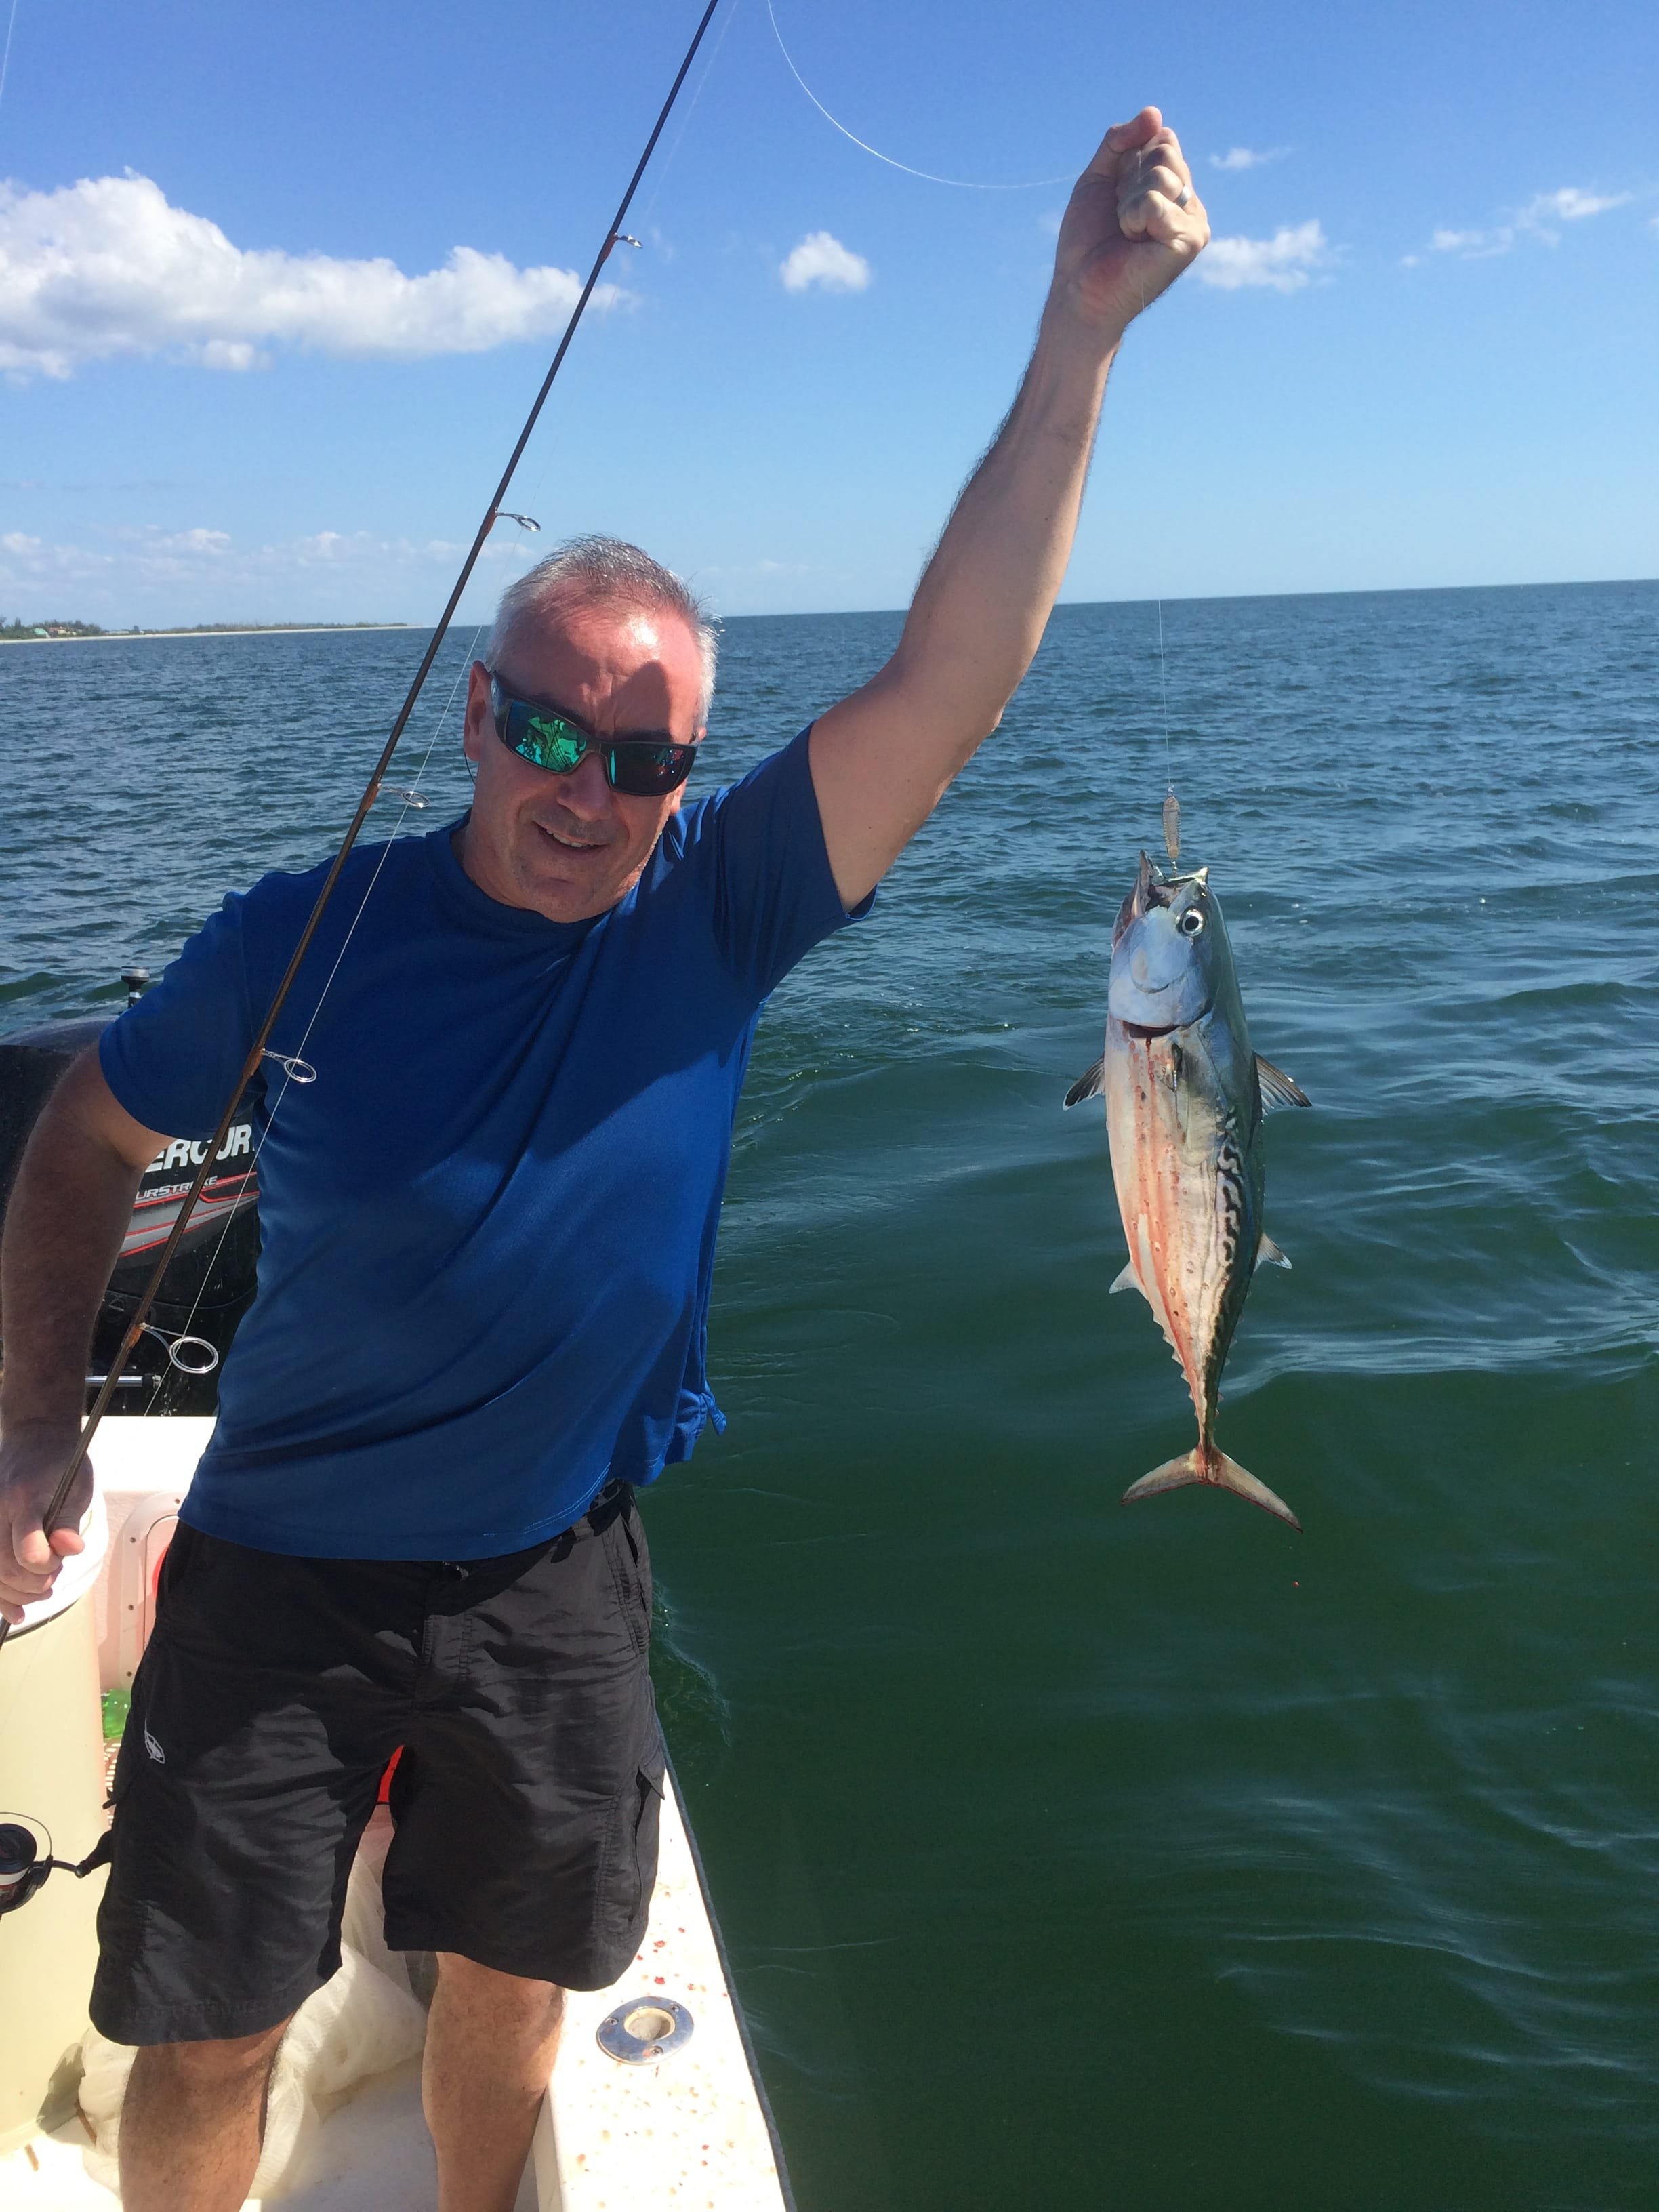 False Albacore Tuna, Little Tunny, 10-17-14,, Sanibel Fishing & Captiva Fishing & Fort Myers Fishing Charters & Guide Service.